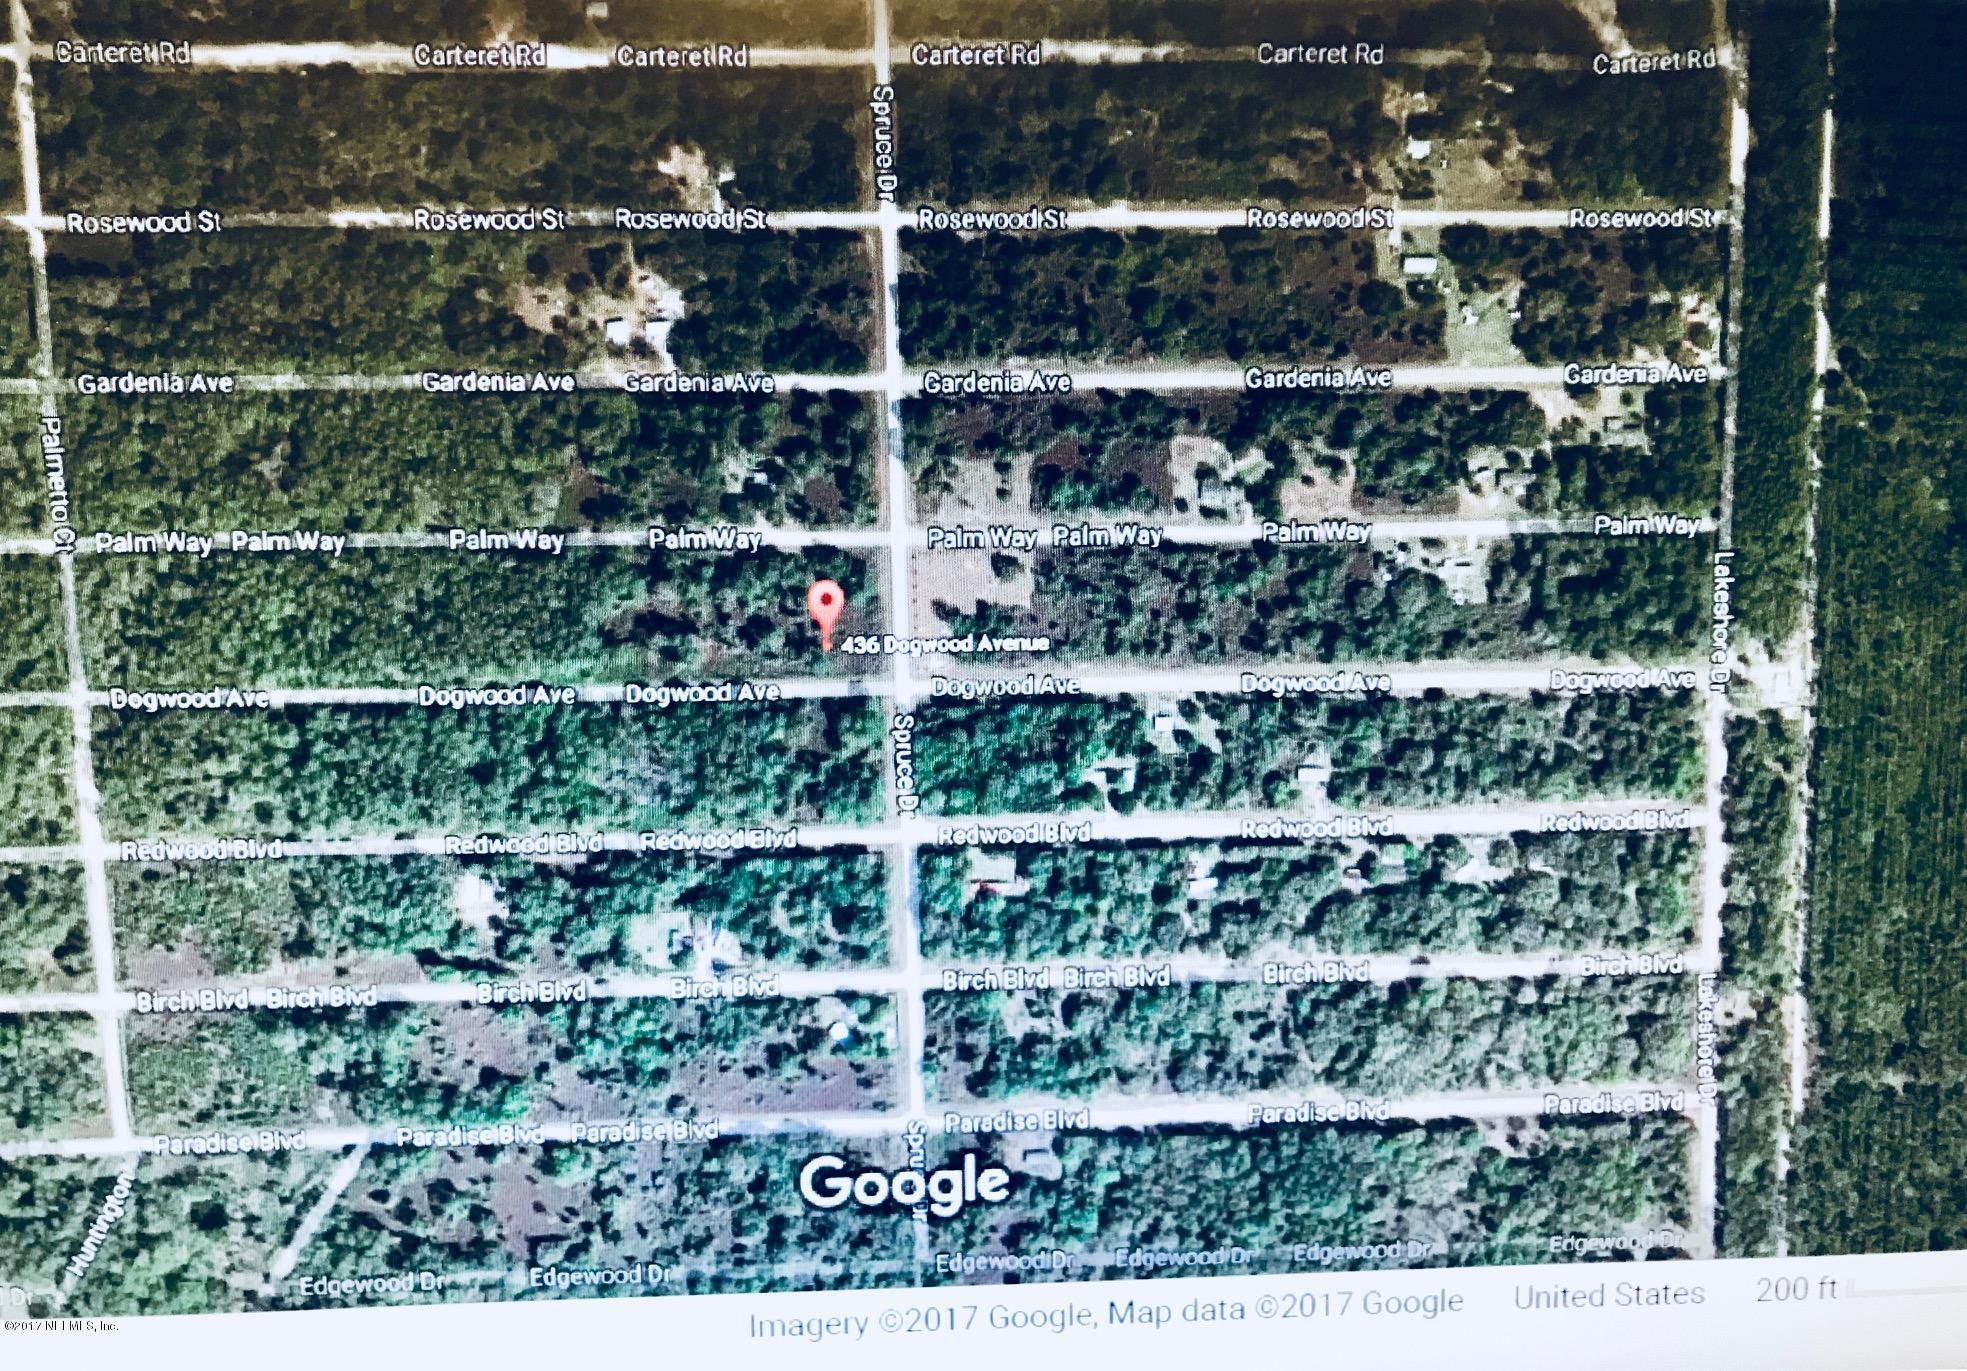 436 DOGWOOD, GEORGETOWN, FLORIDA 32139, ,Vacant land,For sale,DOGWOOD,904509